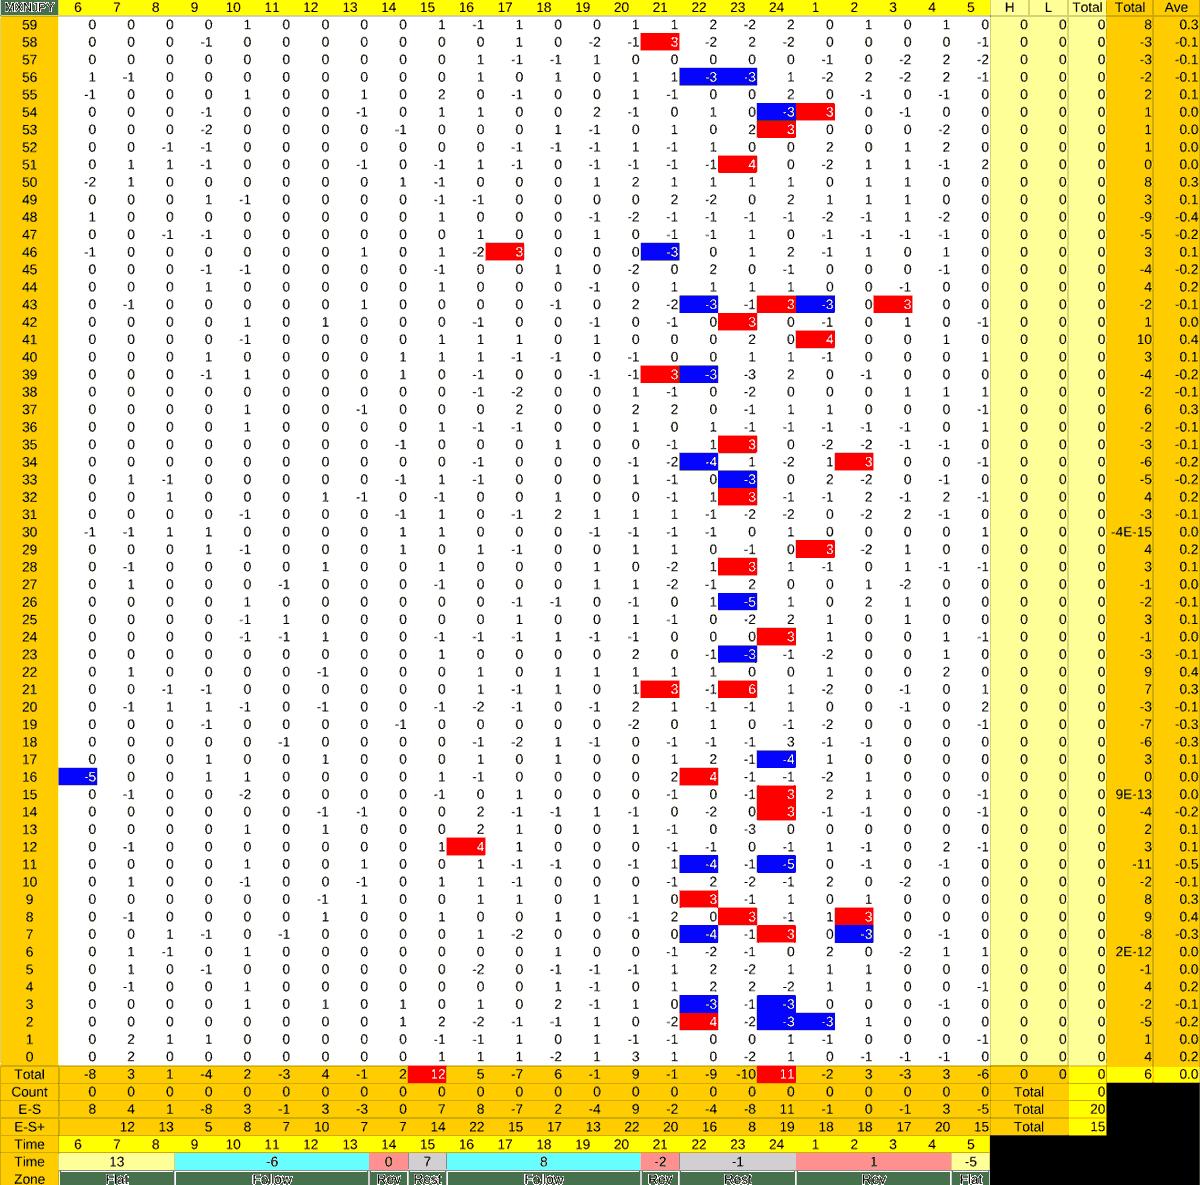 20210701_HS(3)MXNJPY